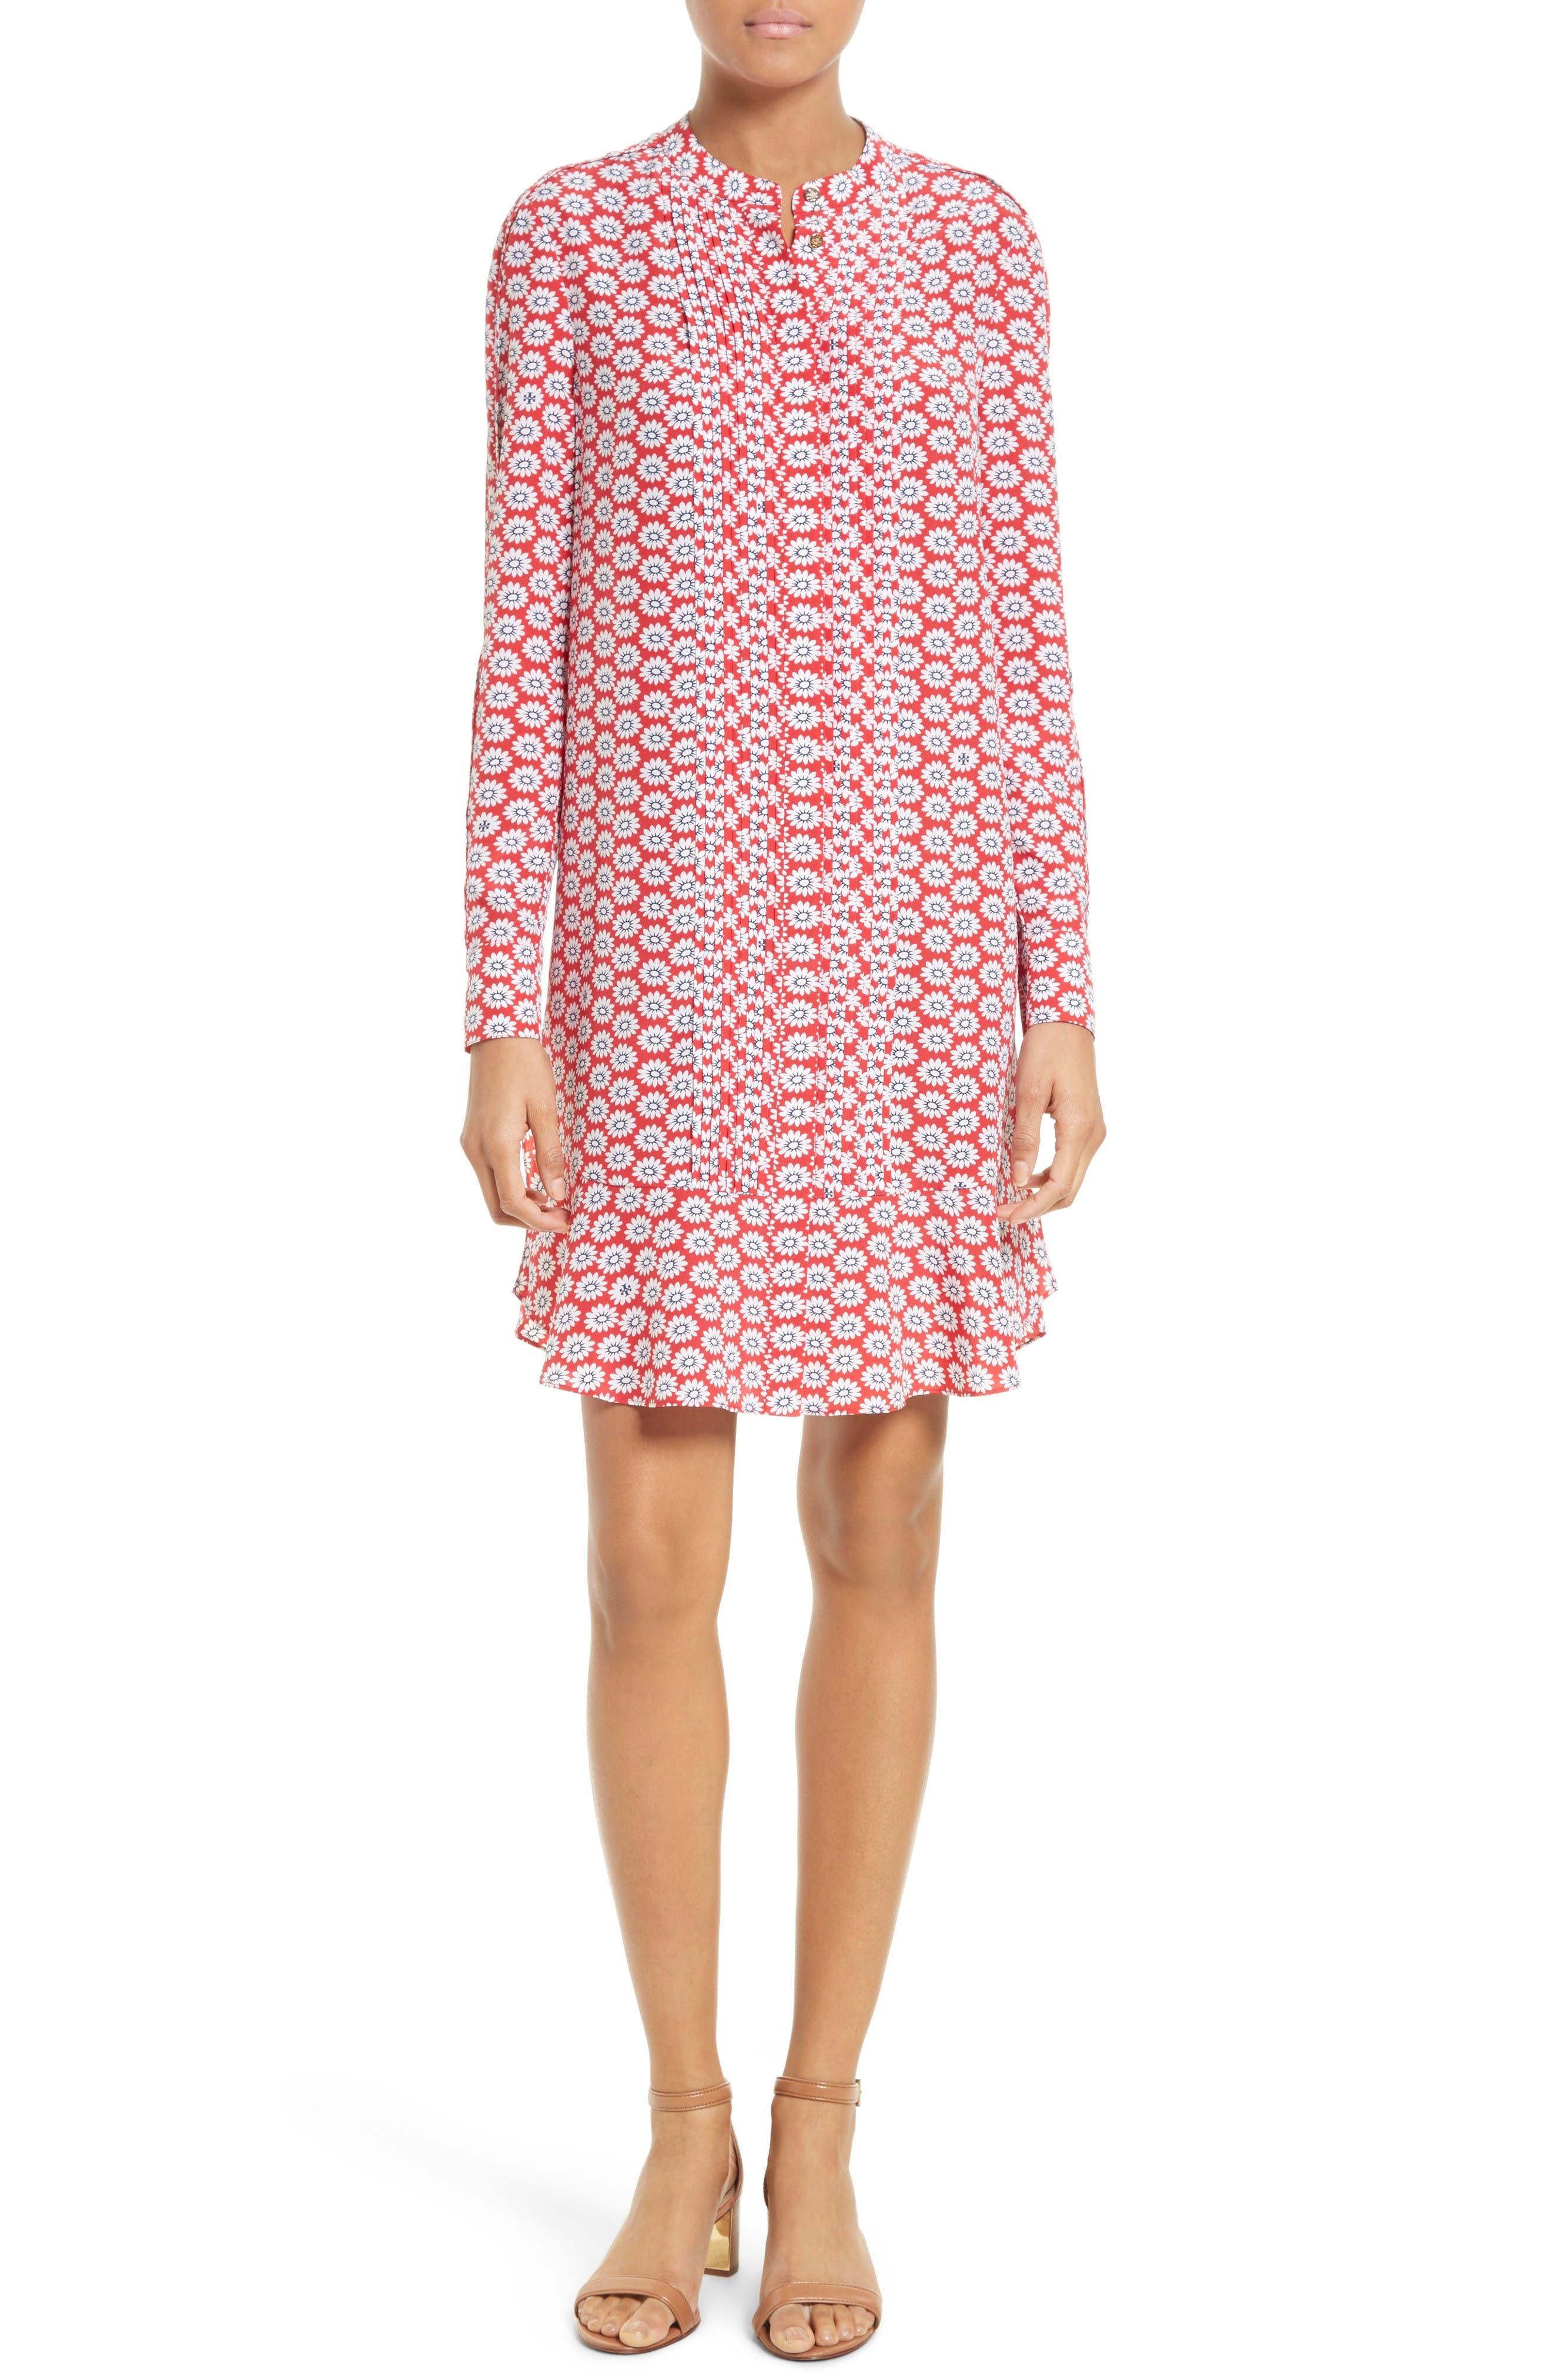 Tory Burch Cora Floral Print Silk Shift Dress